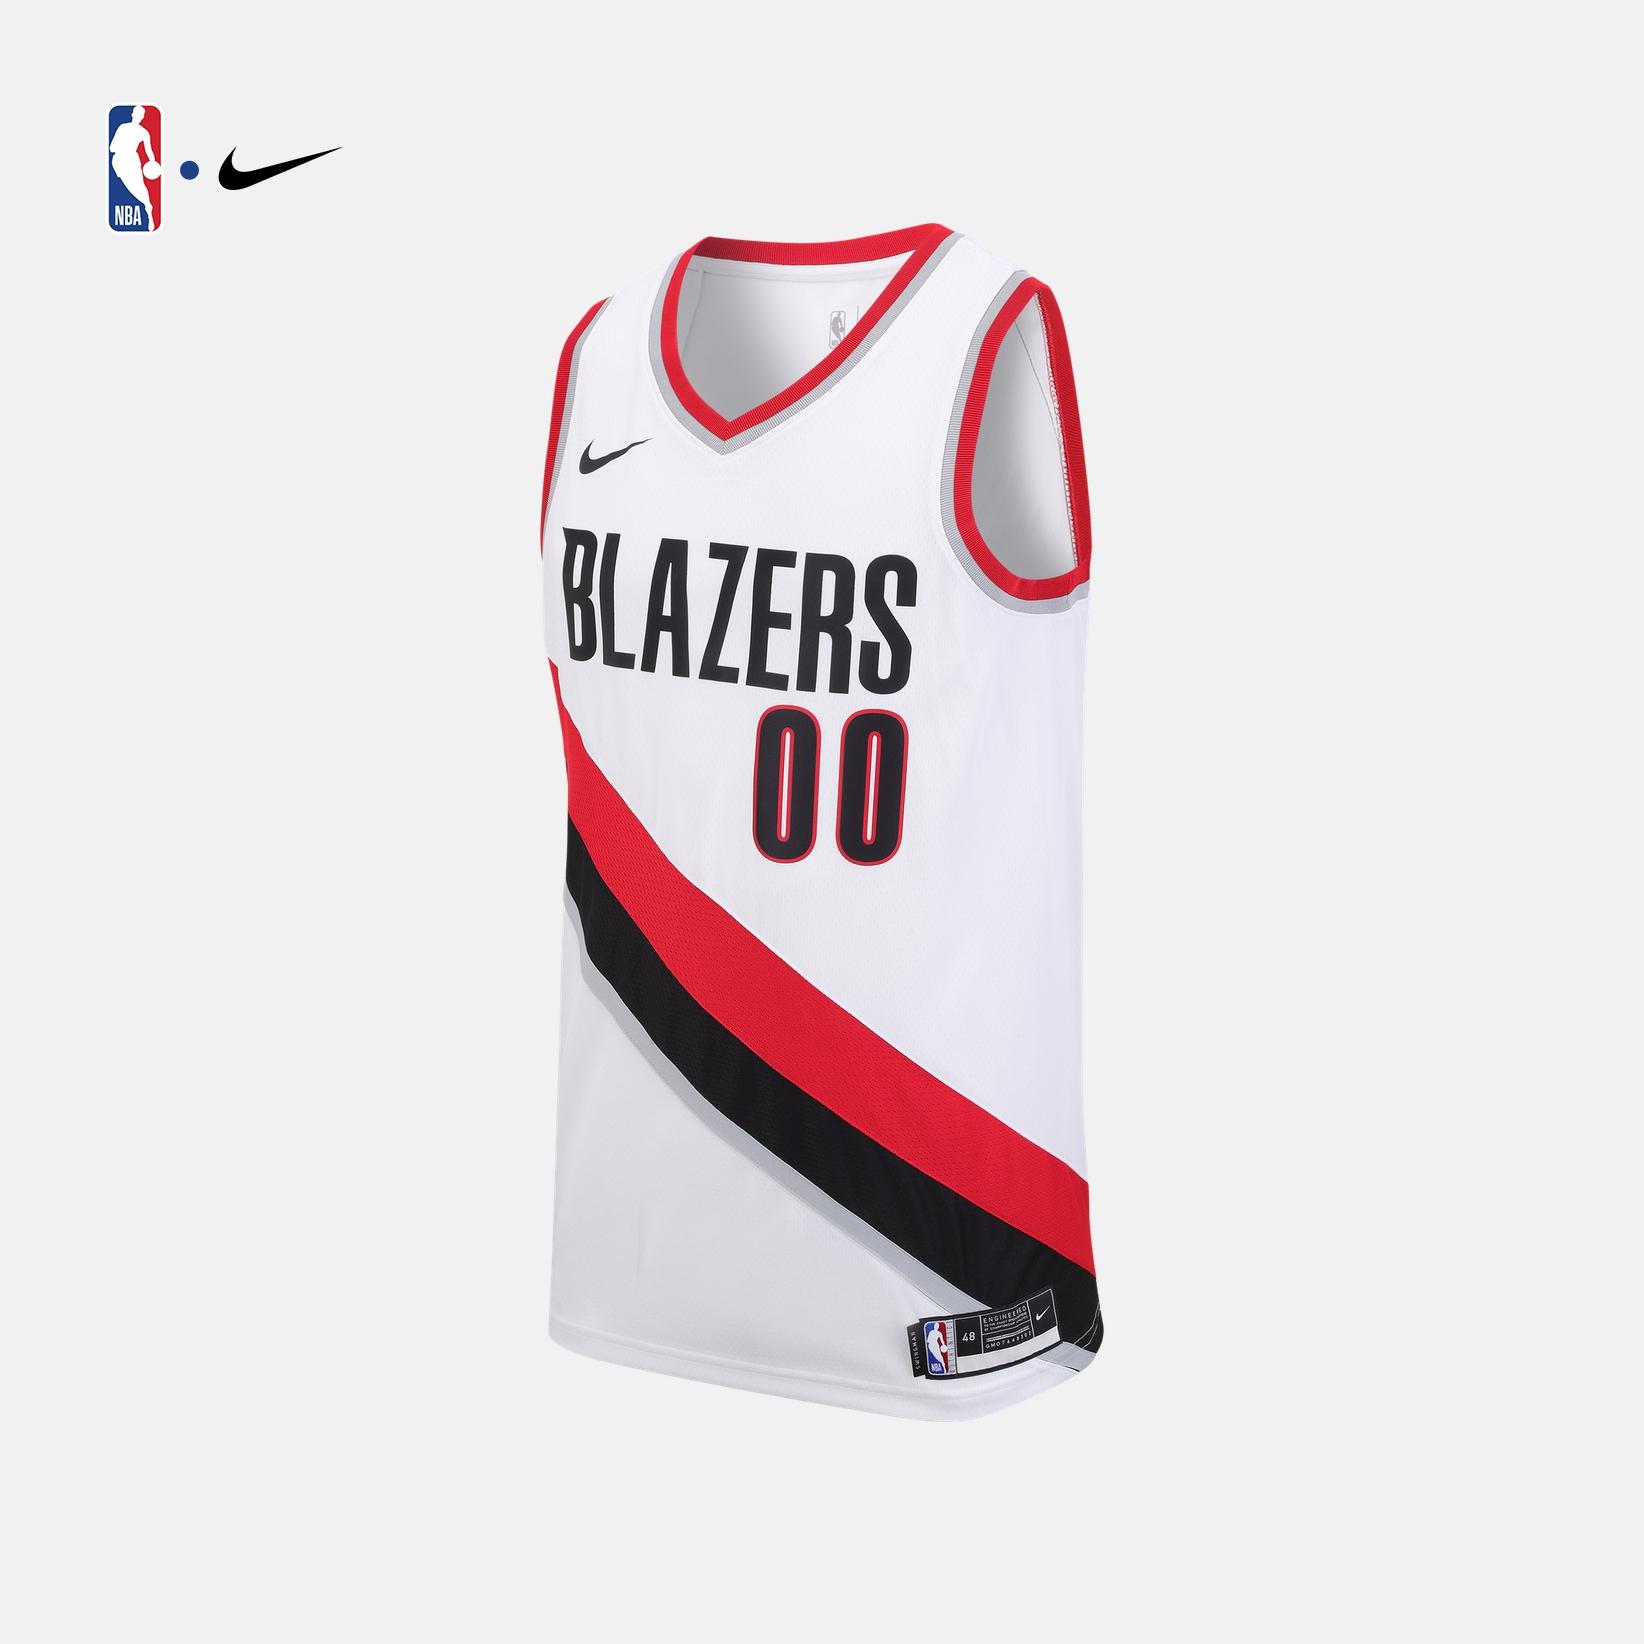 NBA-Nike 波特兰开拓者队 安东尼 Association Edition SW 球衣